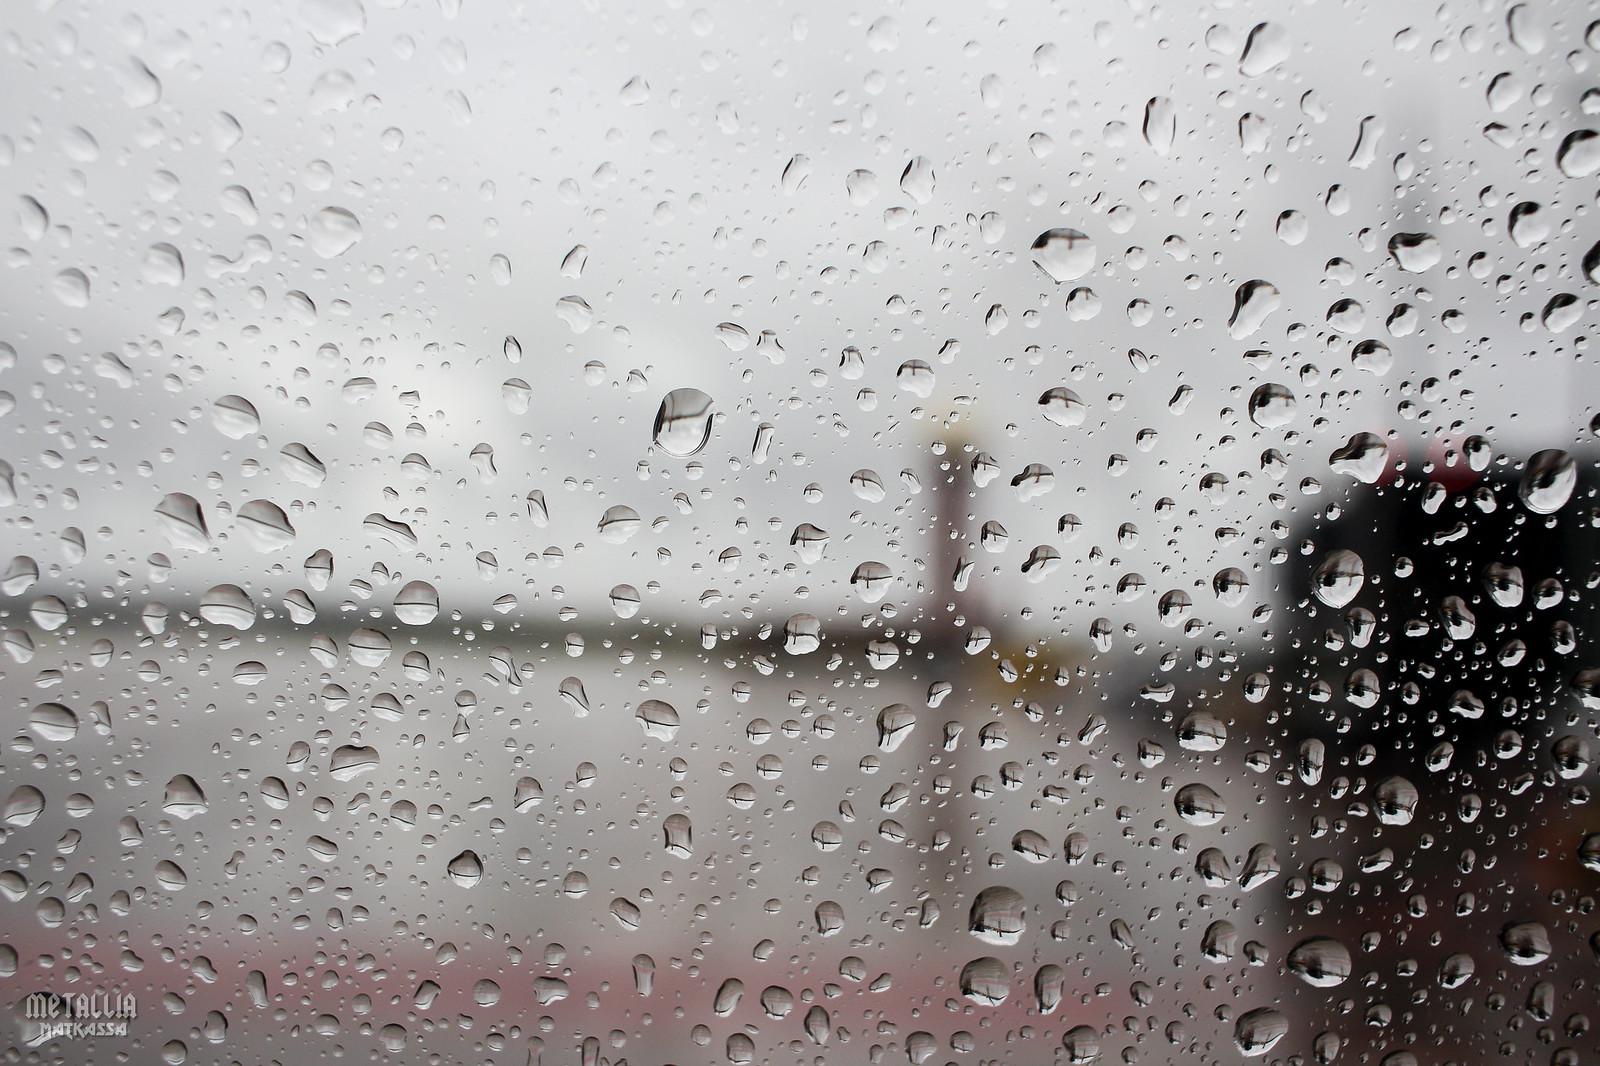 lot polish airlines, lot, polskie linie lotnicze, gdansk port lotniczy